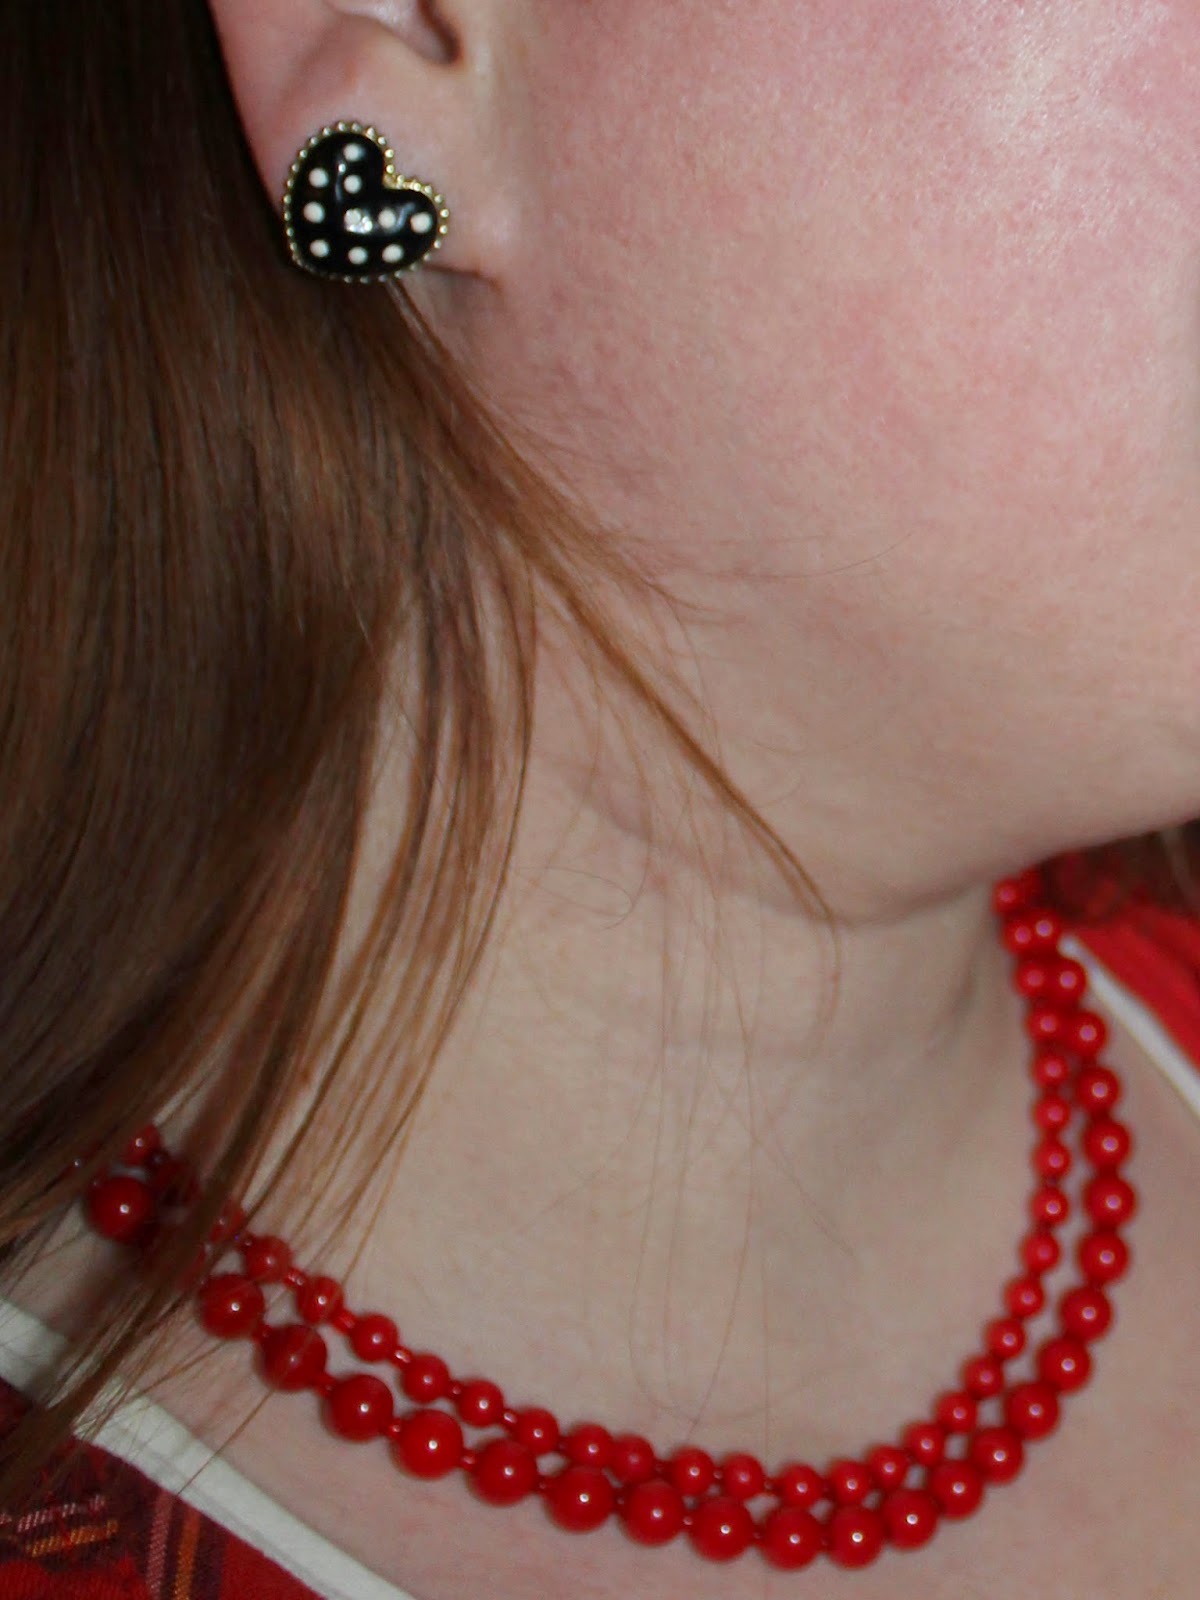 polka-dot heart earrings, red bead necklace